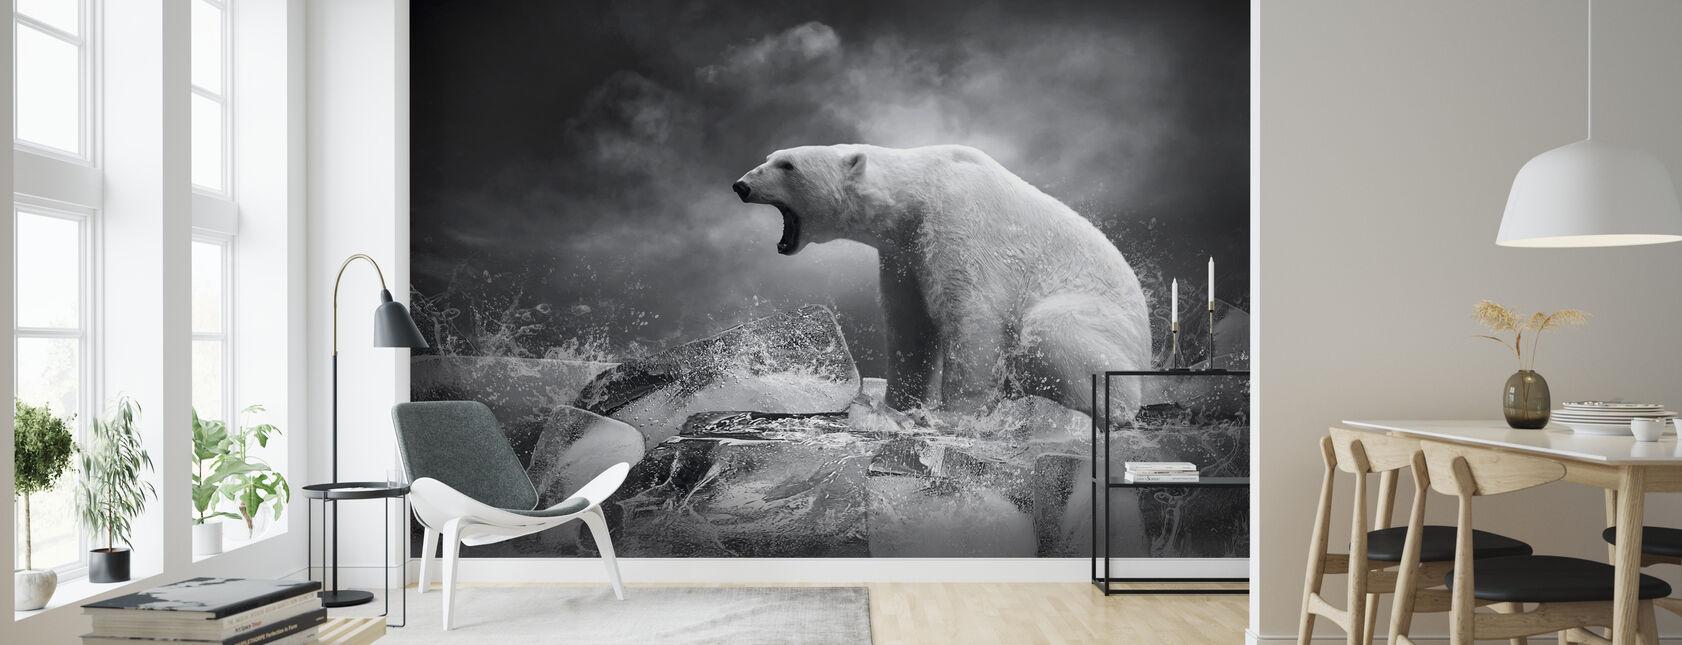 Hvit isbjørn jeger - Tapet - Stue